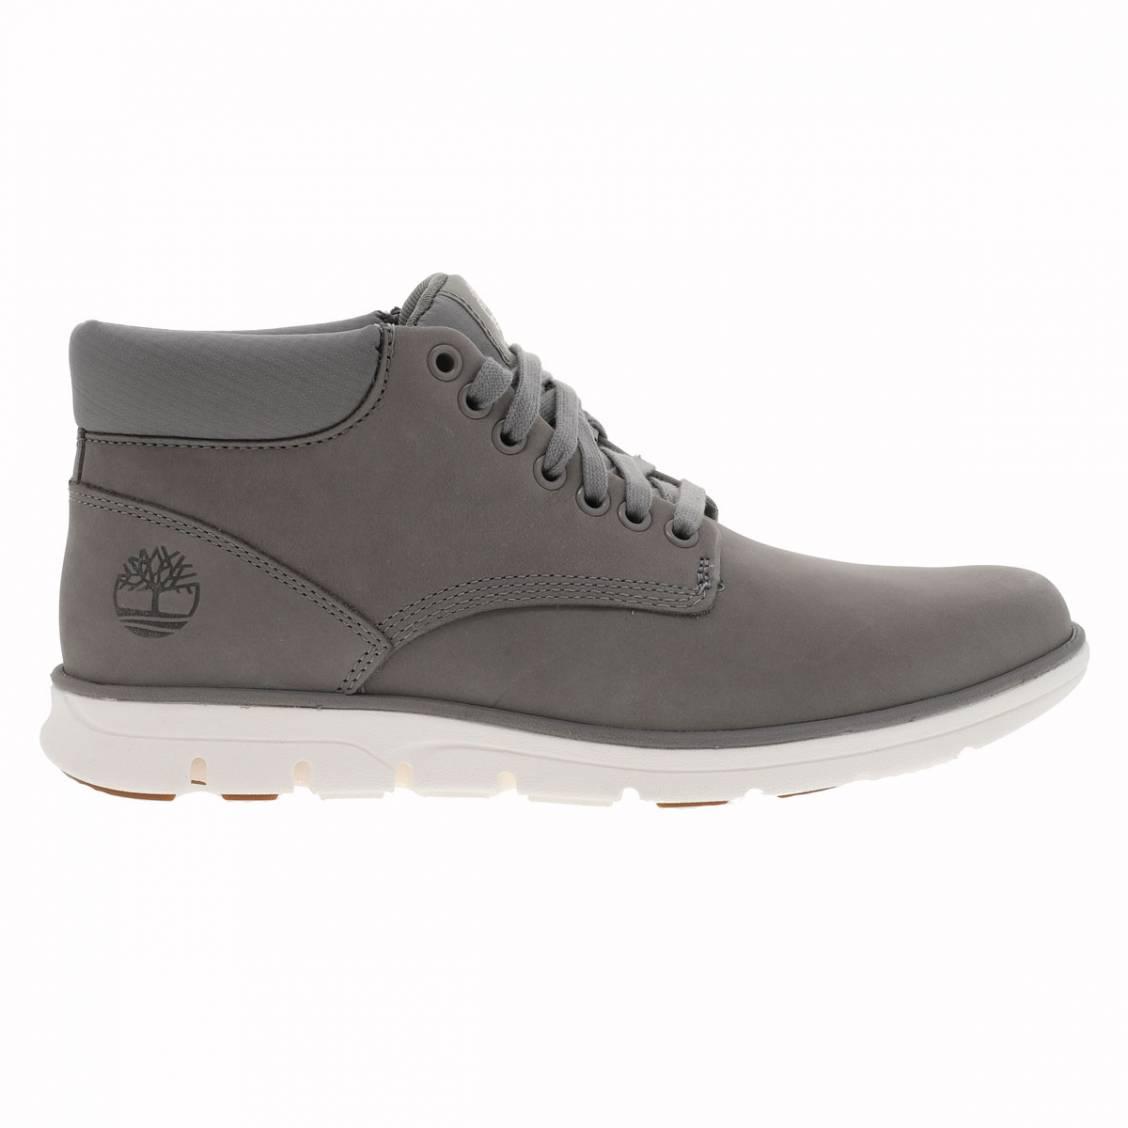 Boots fines  bradstreet en cuir véritable gris